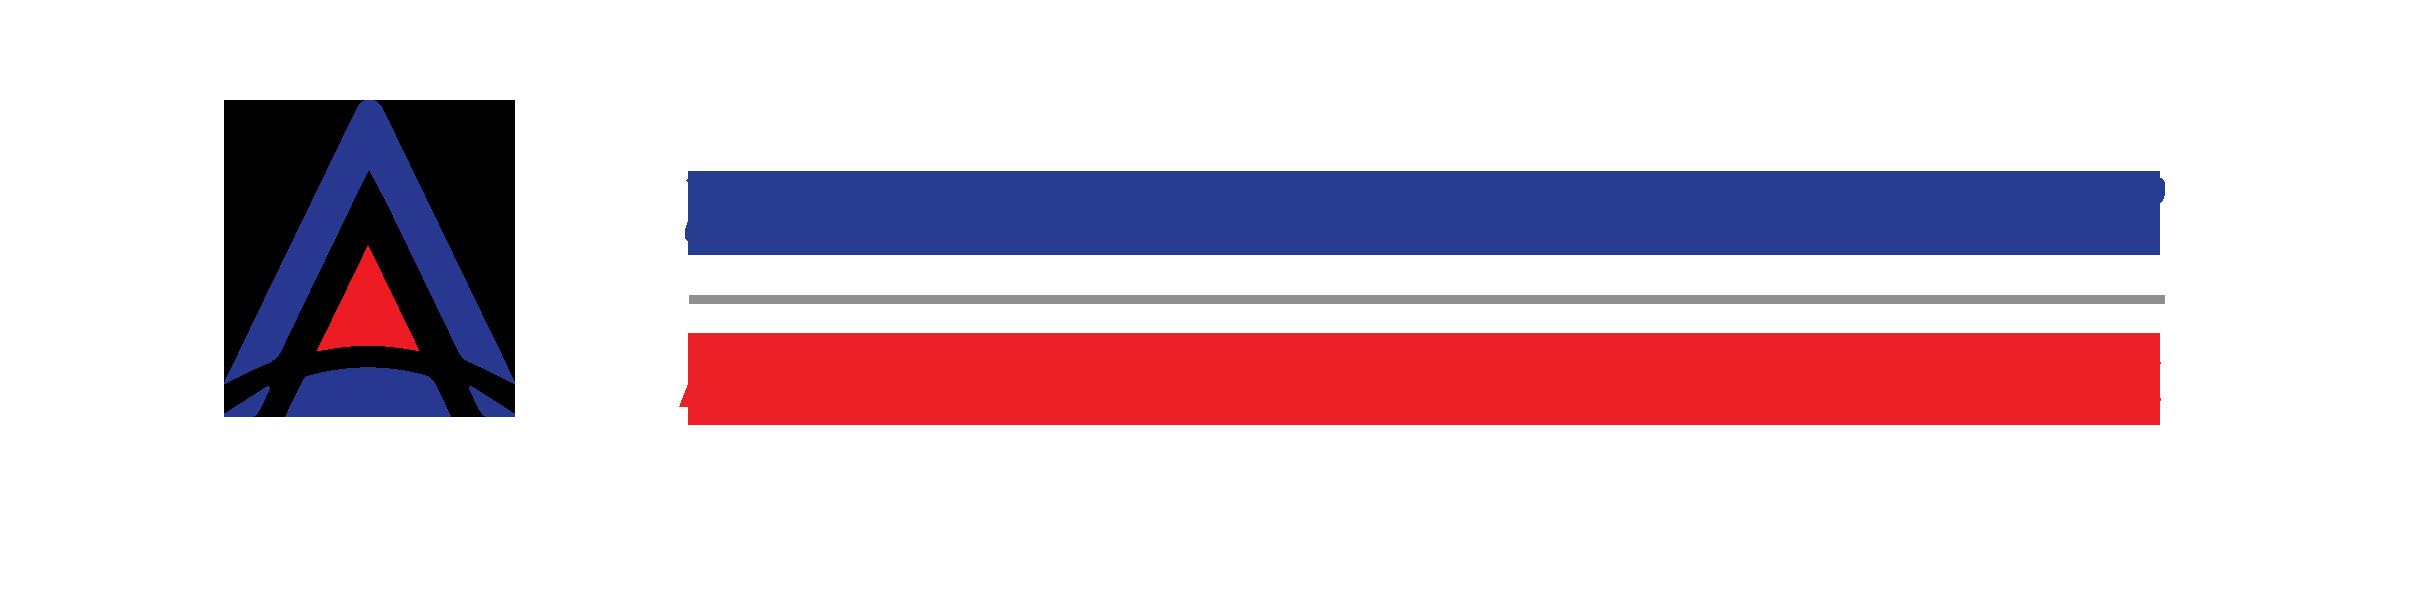 ACME Engineering & Trading Plc